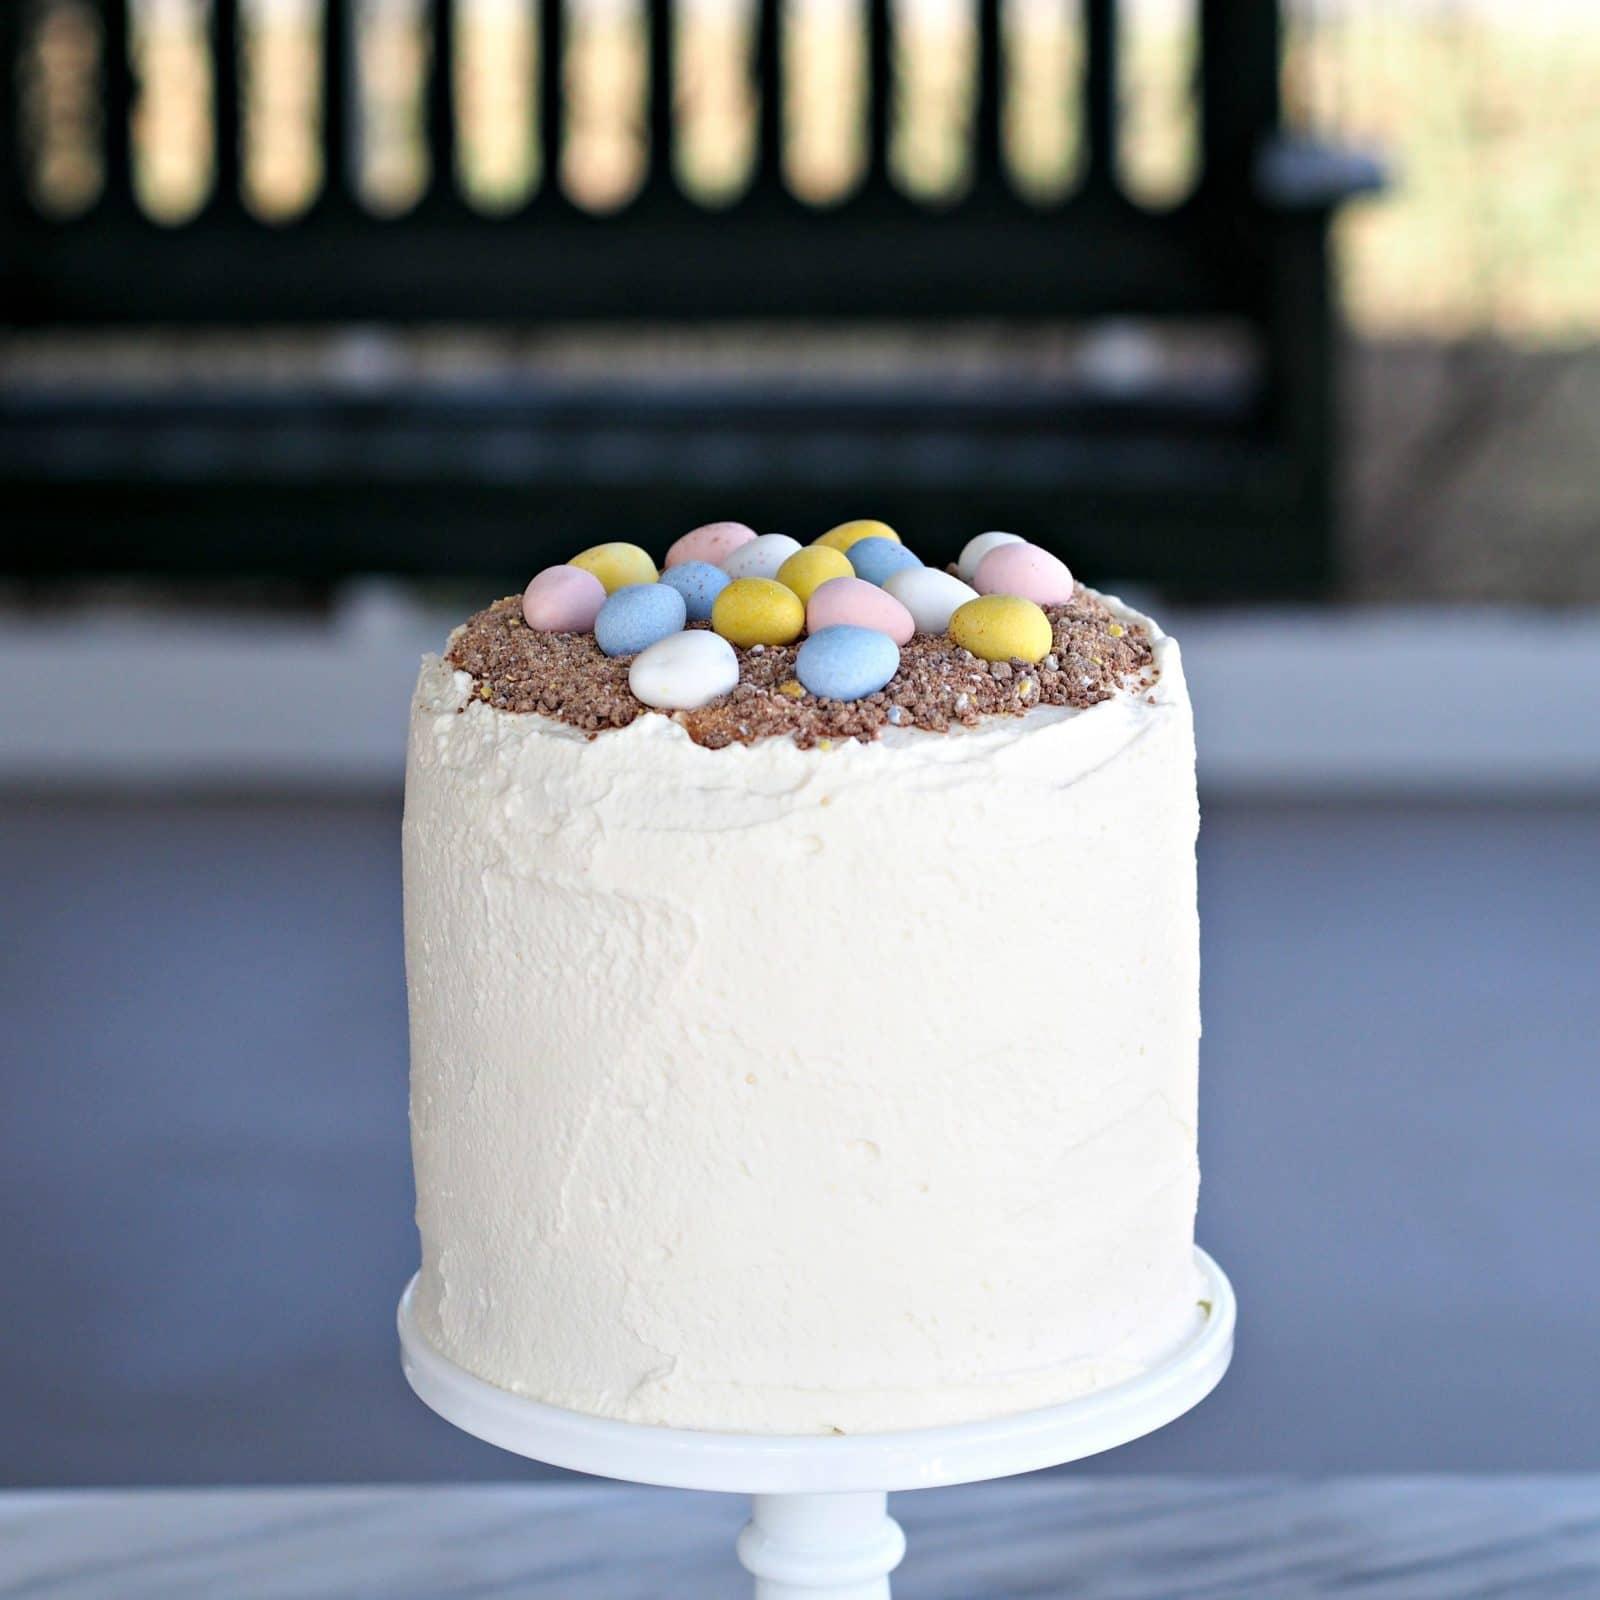 Cadbury Mini Eggs Cake with Mascarpone Whipped Cream. Layers of white cake married with Mascarpone Whipped Cream Frosting mixed w/crushed Cadbury Mini Eggs. Simply Sated